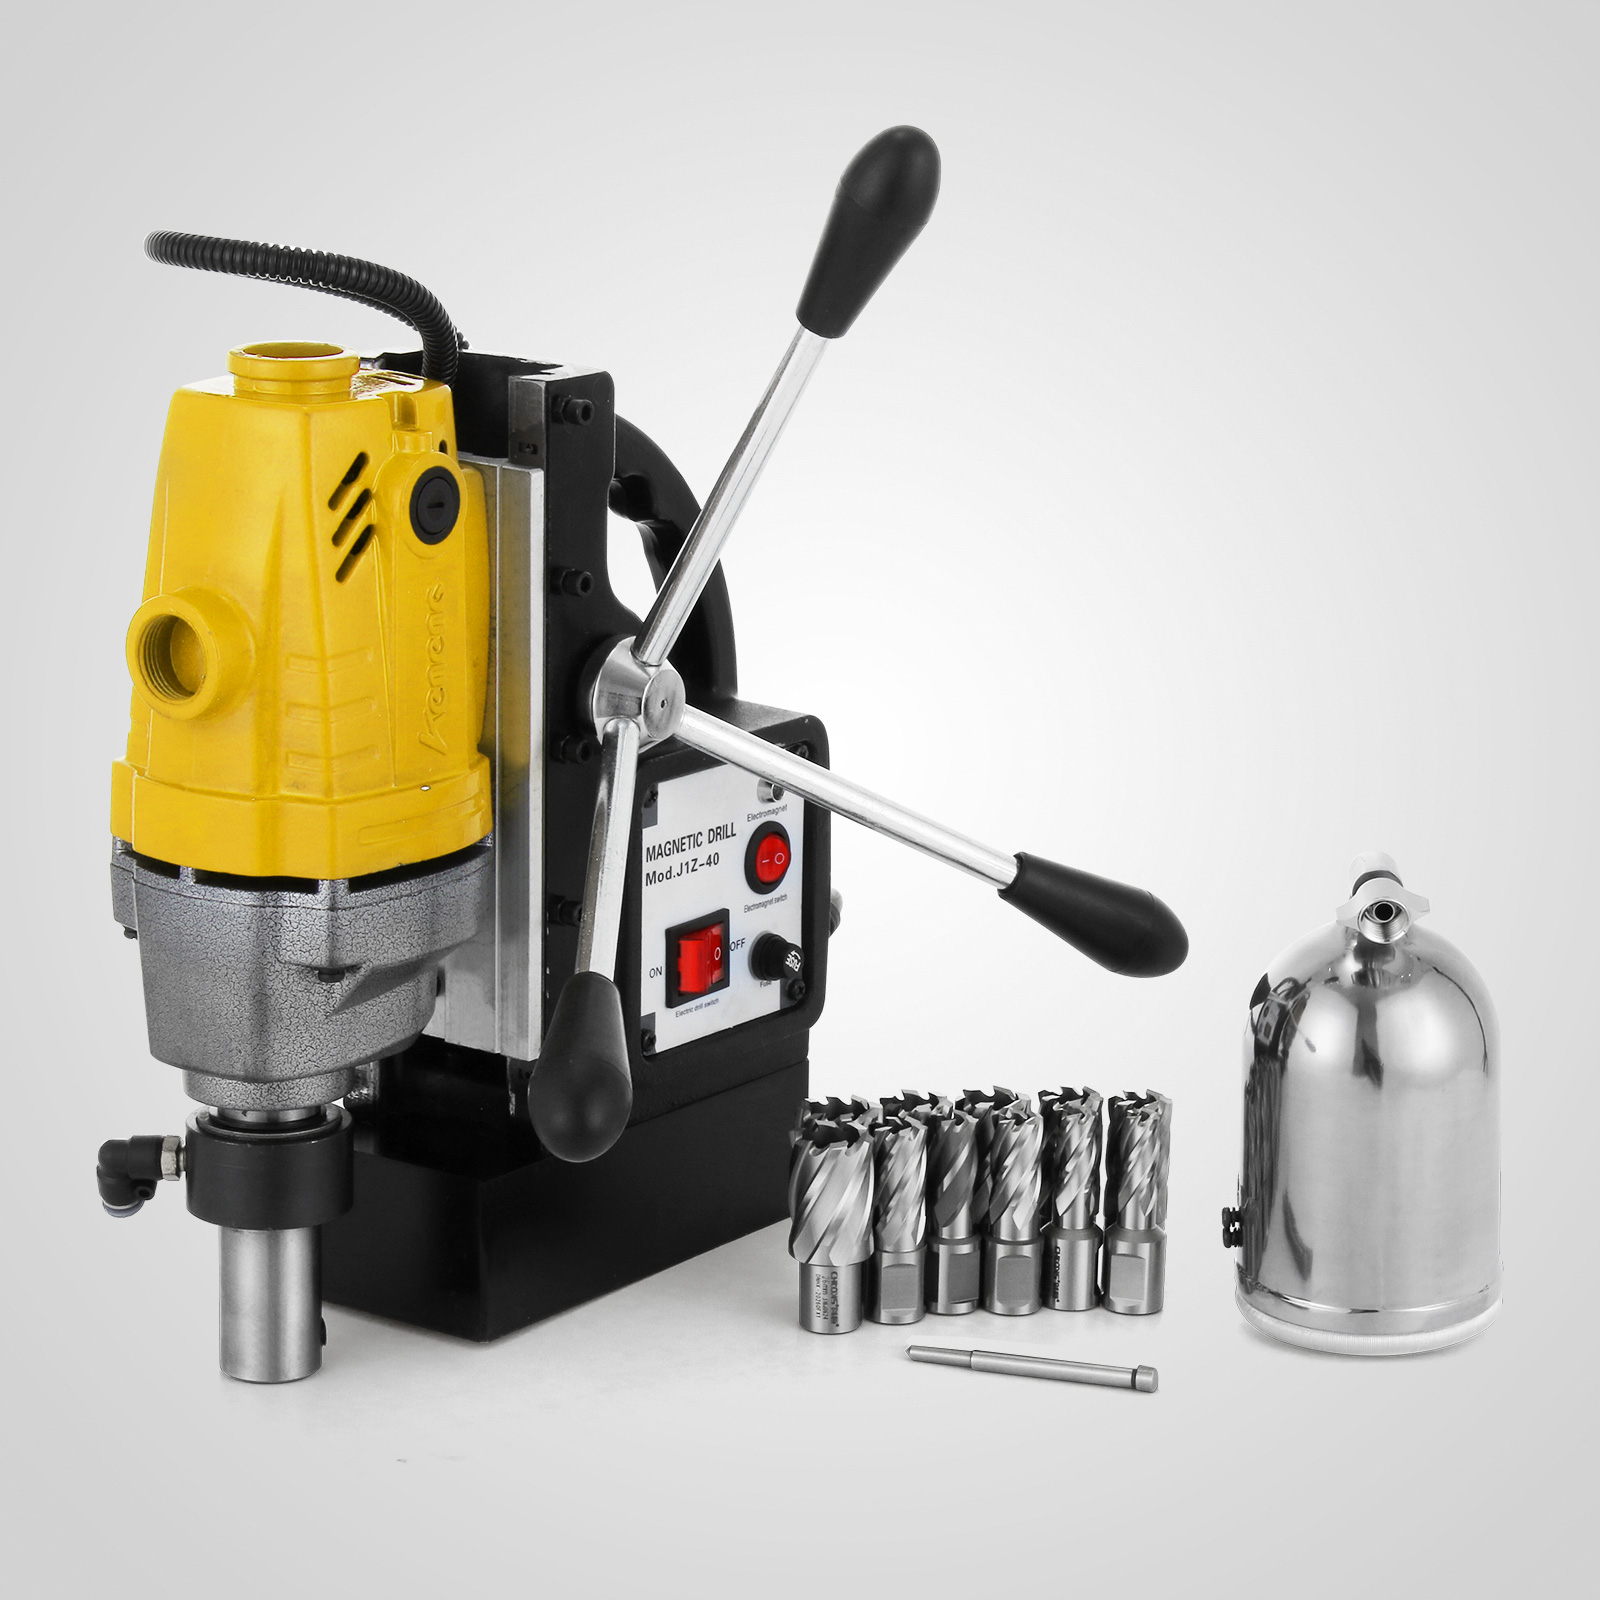 MB23-BRM35-MD40-Trapano-Perforatrice-Carotatore-Fresa-Magnetico-12-40mm-230V miniatura 39